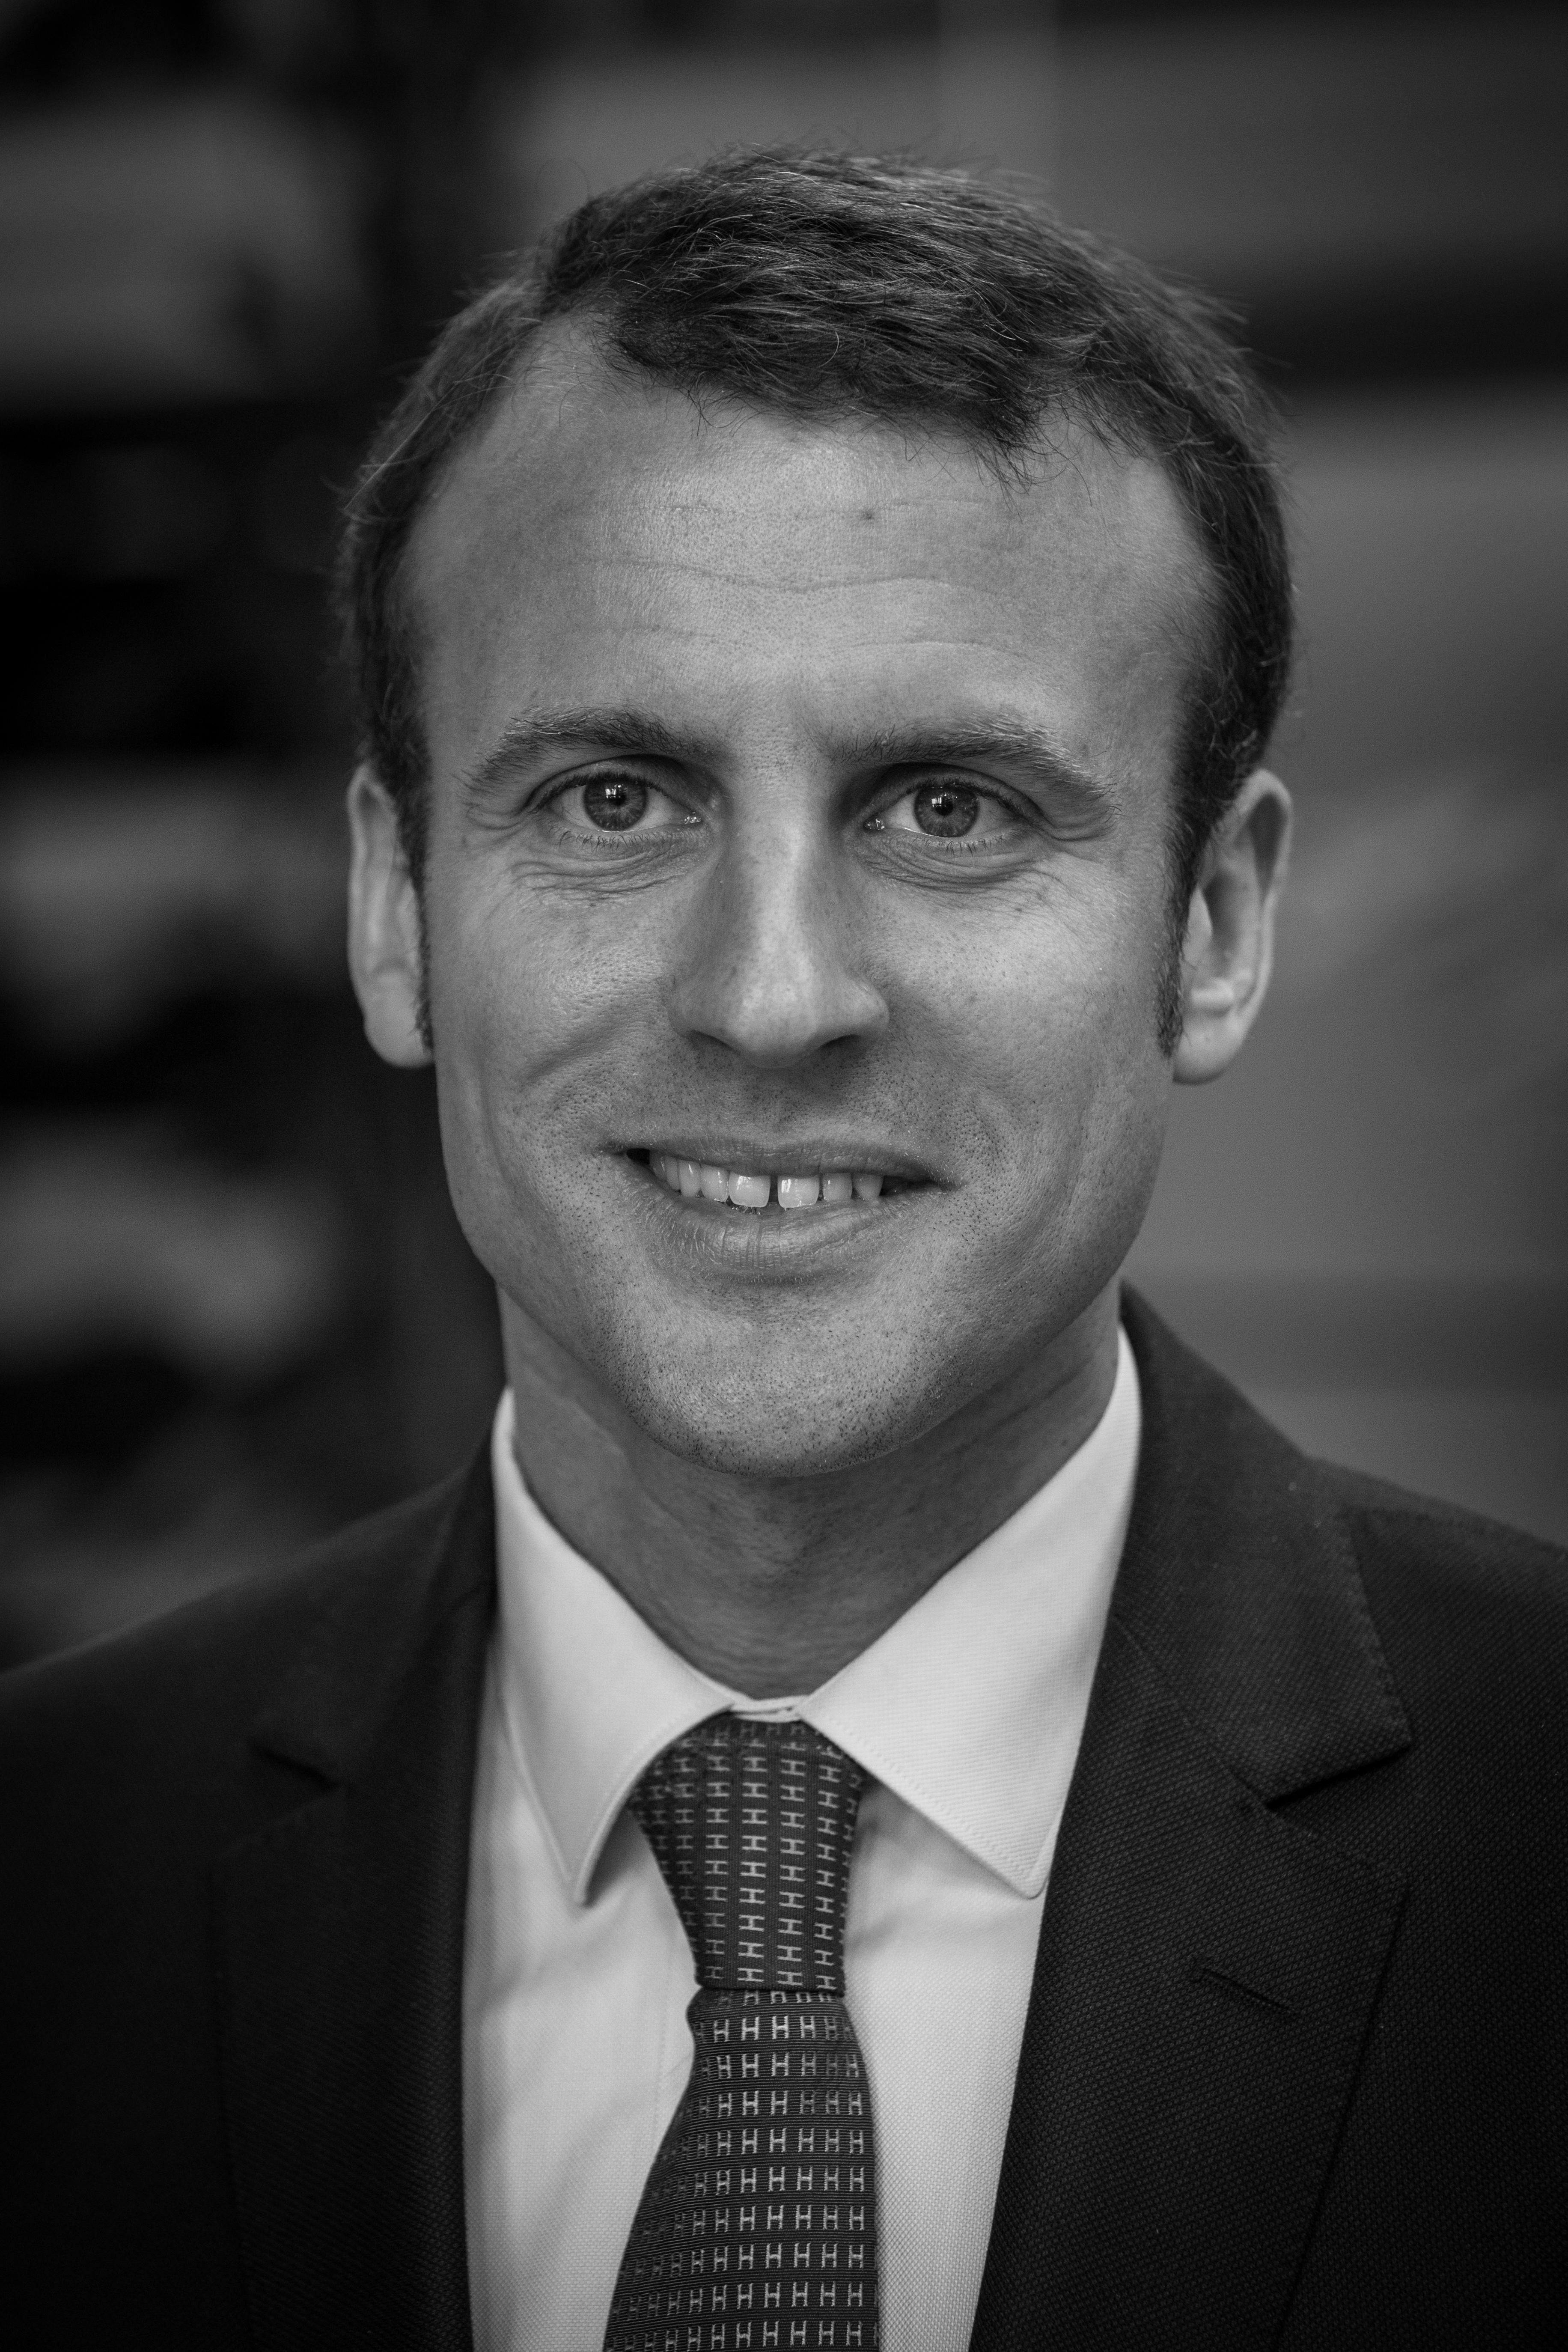 File:Emmanuel Macron par Claude Truong-Ngoc avril 2015.jpg ...